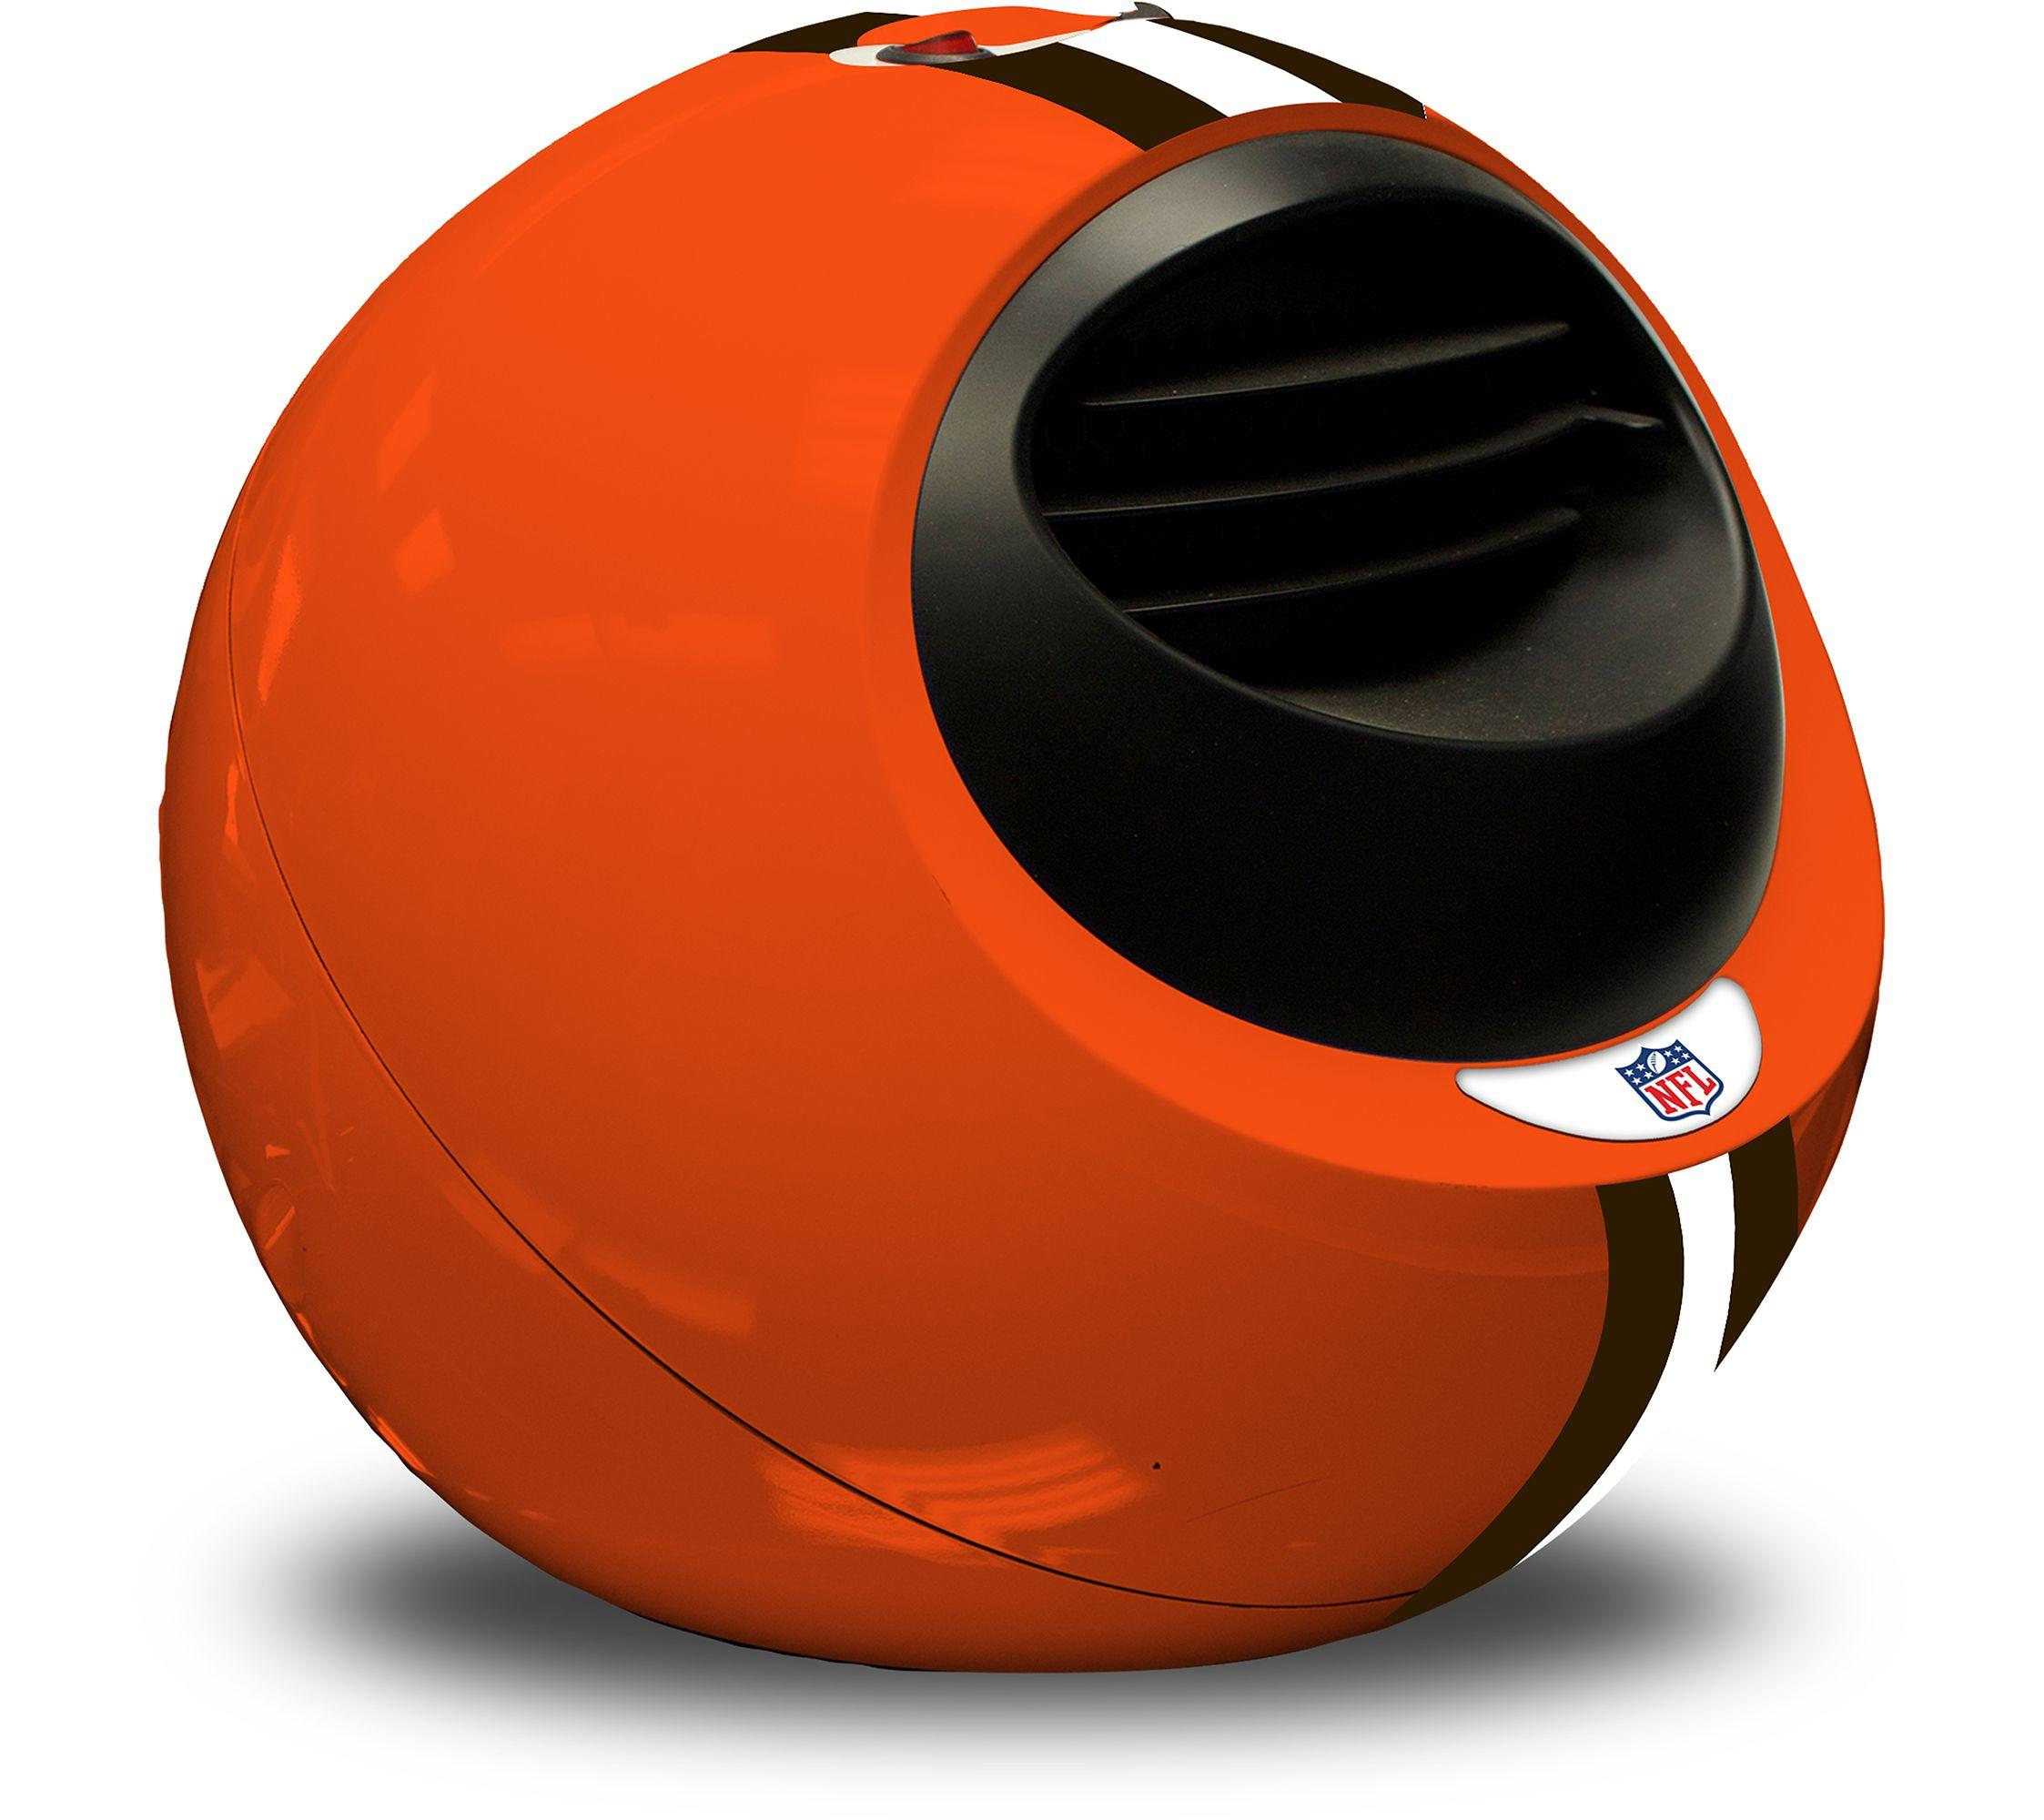 Clevland Browns Officially Licensed Nfl Portable Infrared Helmet Heater Cleveland Browns Helmet Cleveland